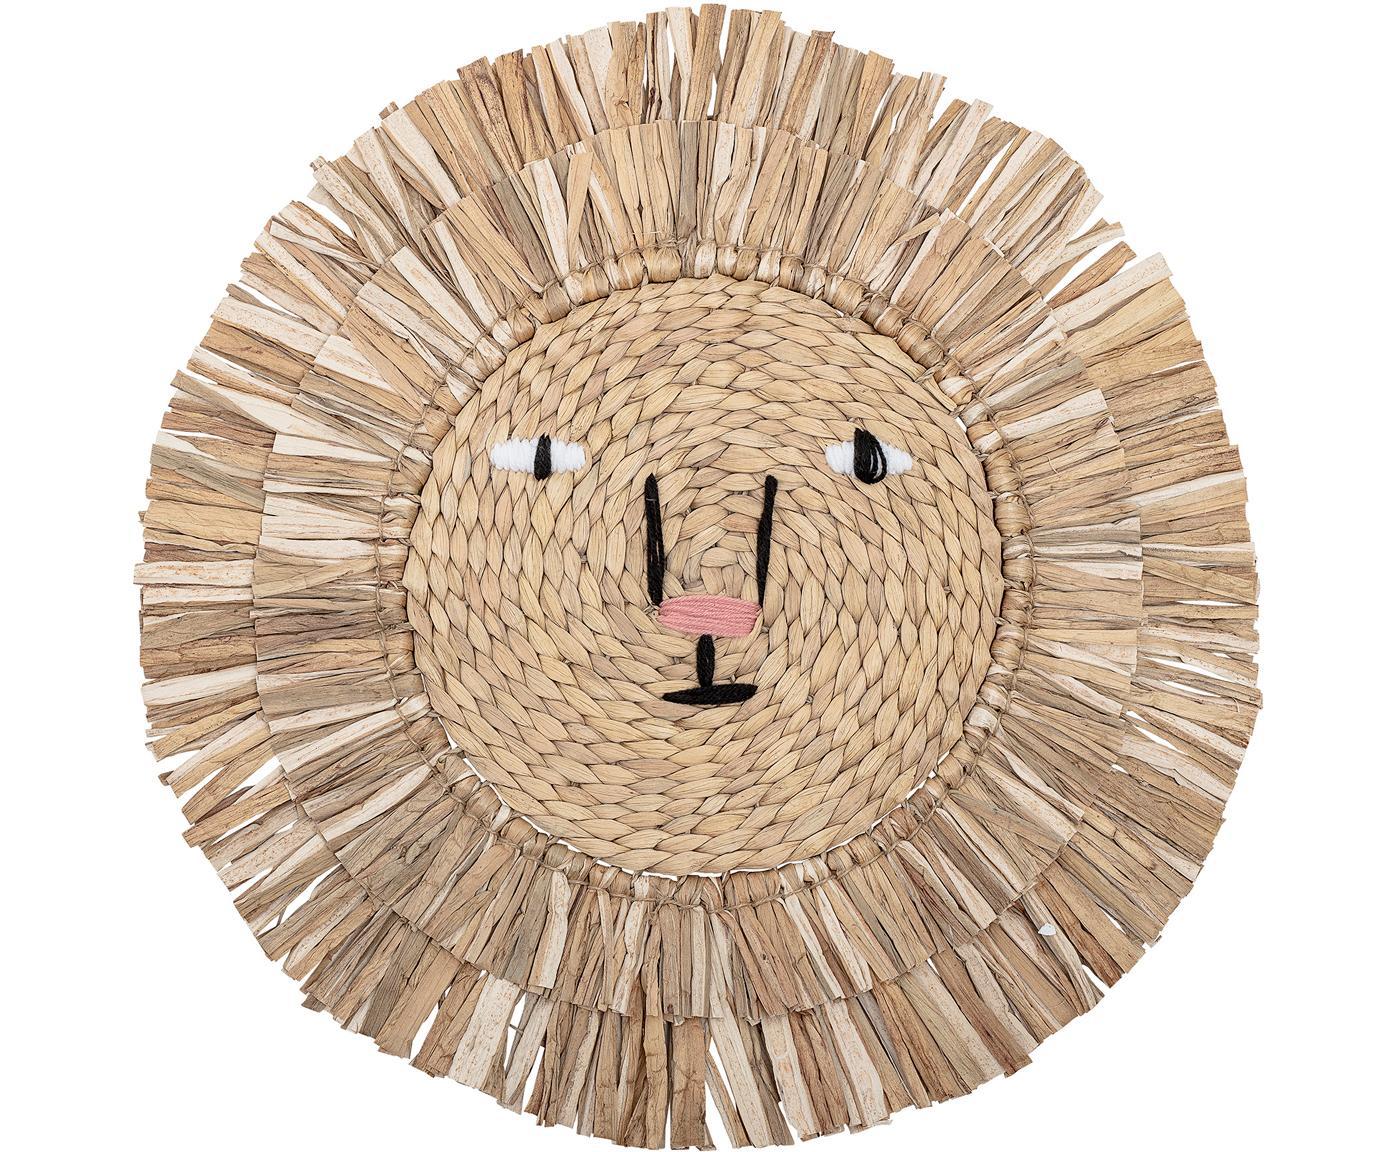 Wandobjekt Sunny, Wasserhyazinthe, Beige, Ø 63 cm